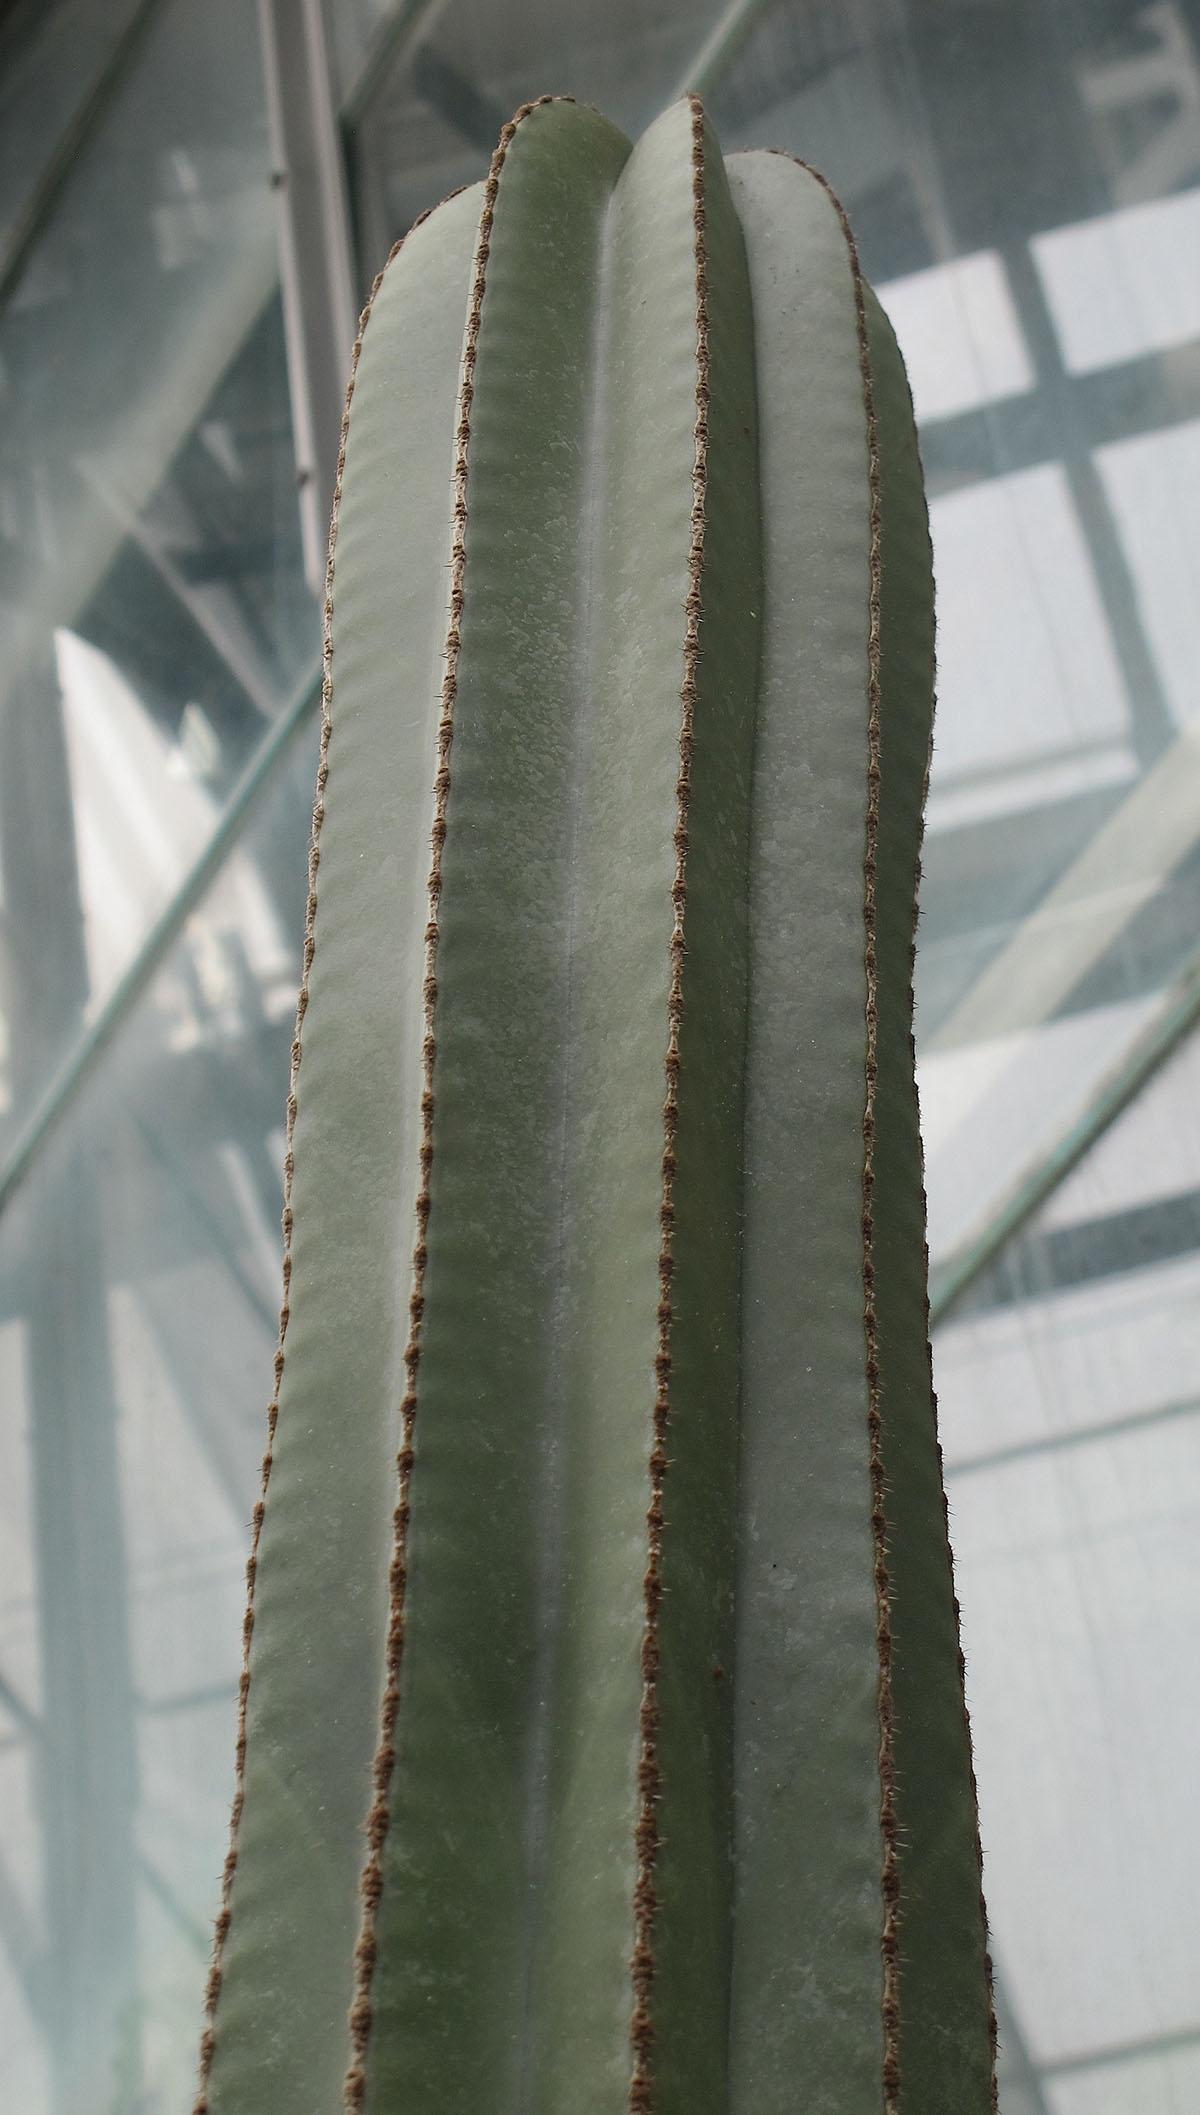 Pachycereus marginatus 3